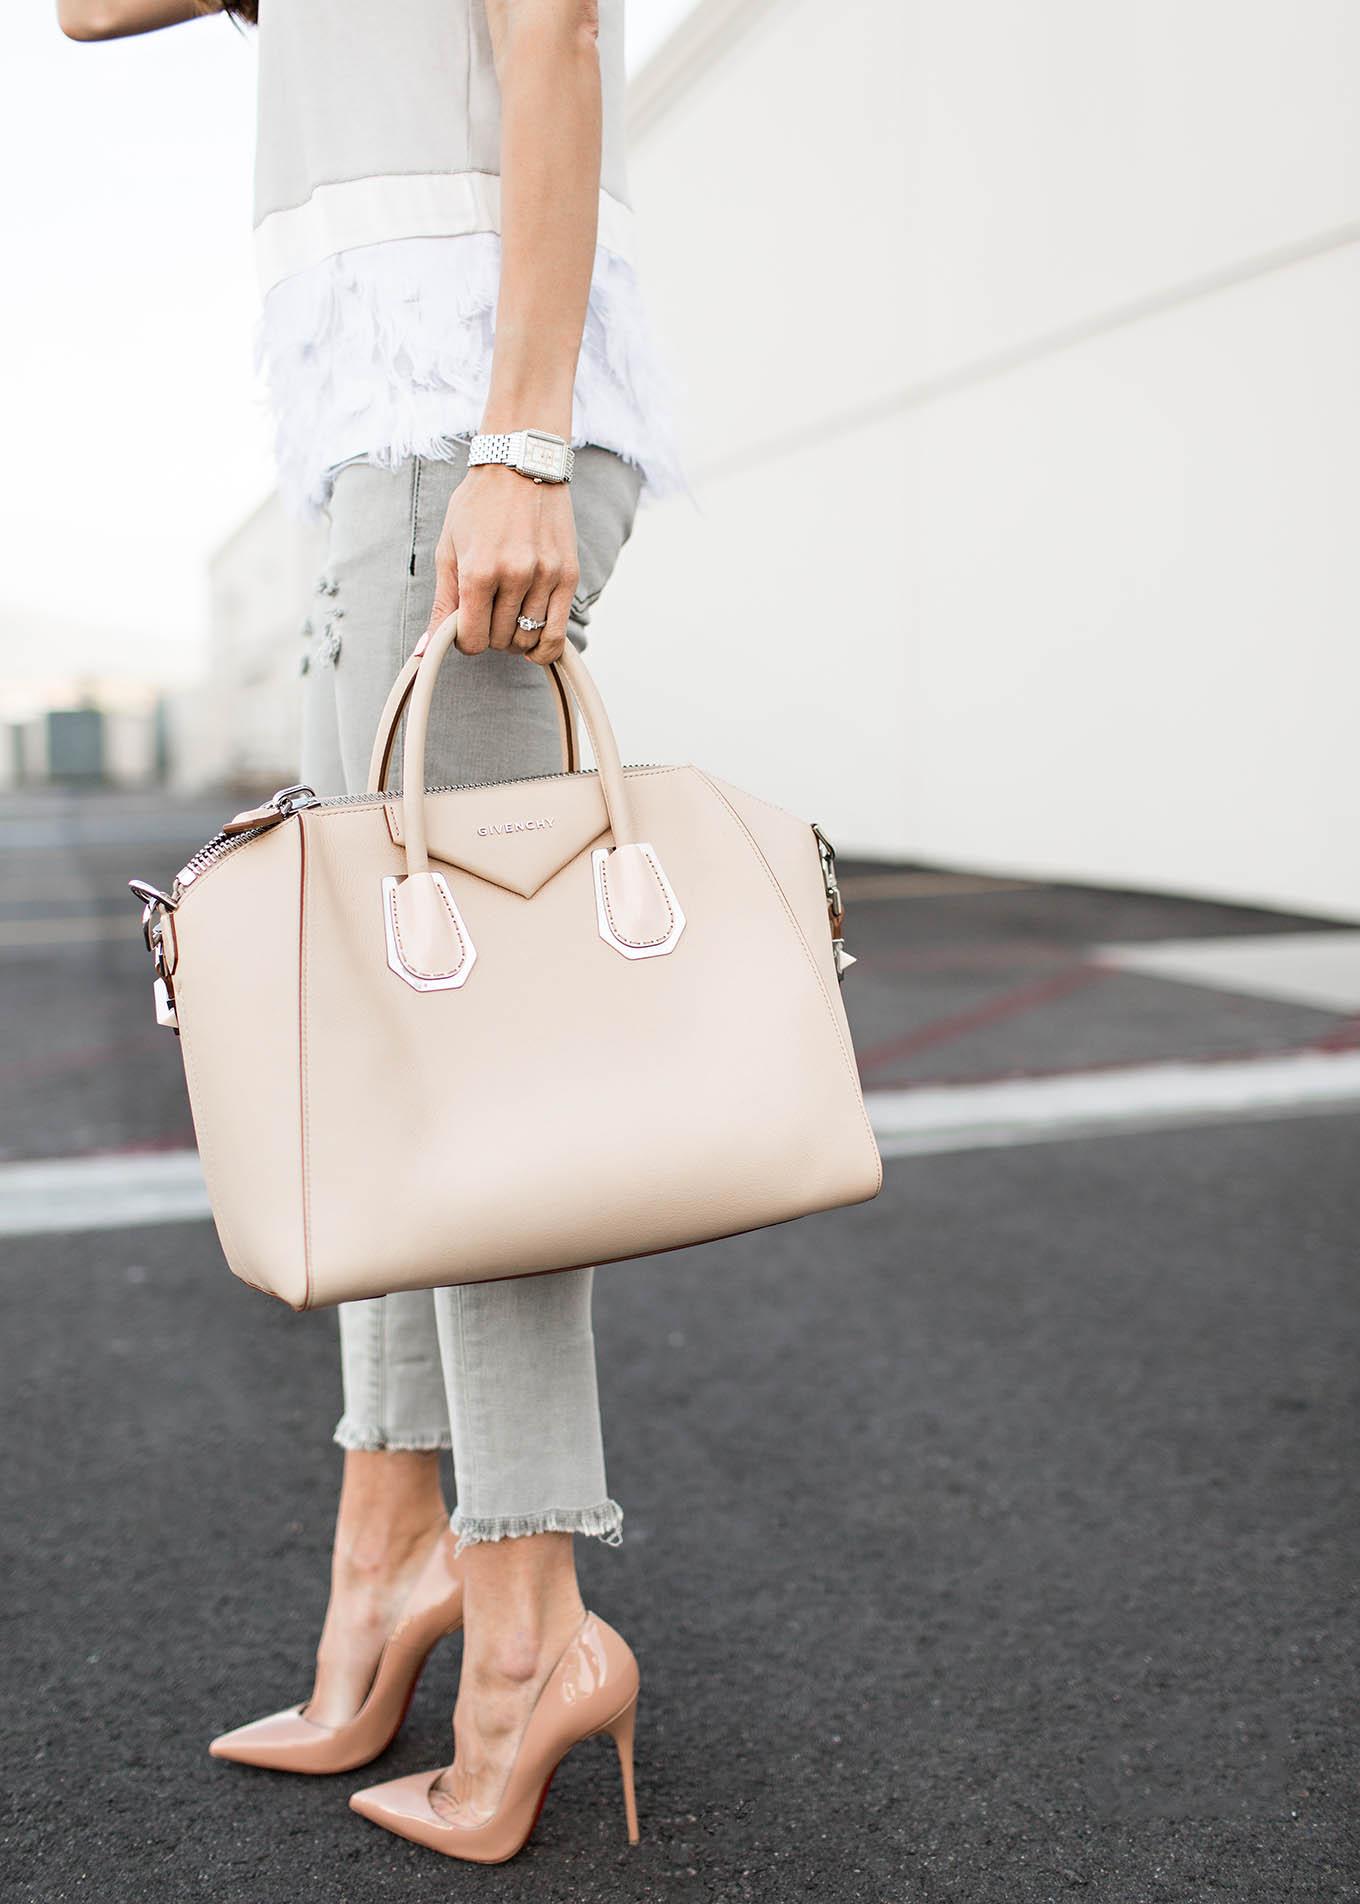 Givenchy Bag Hello fashion Blog